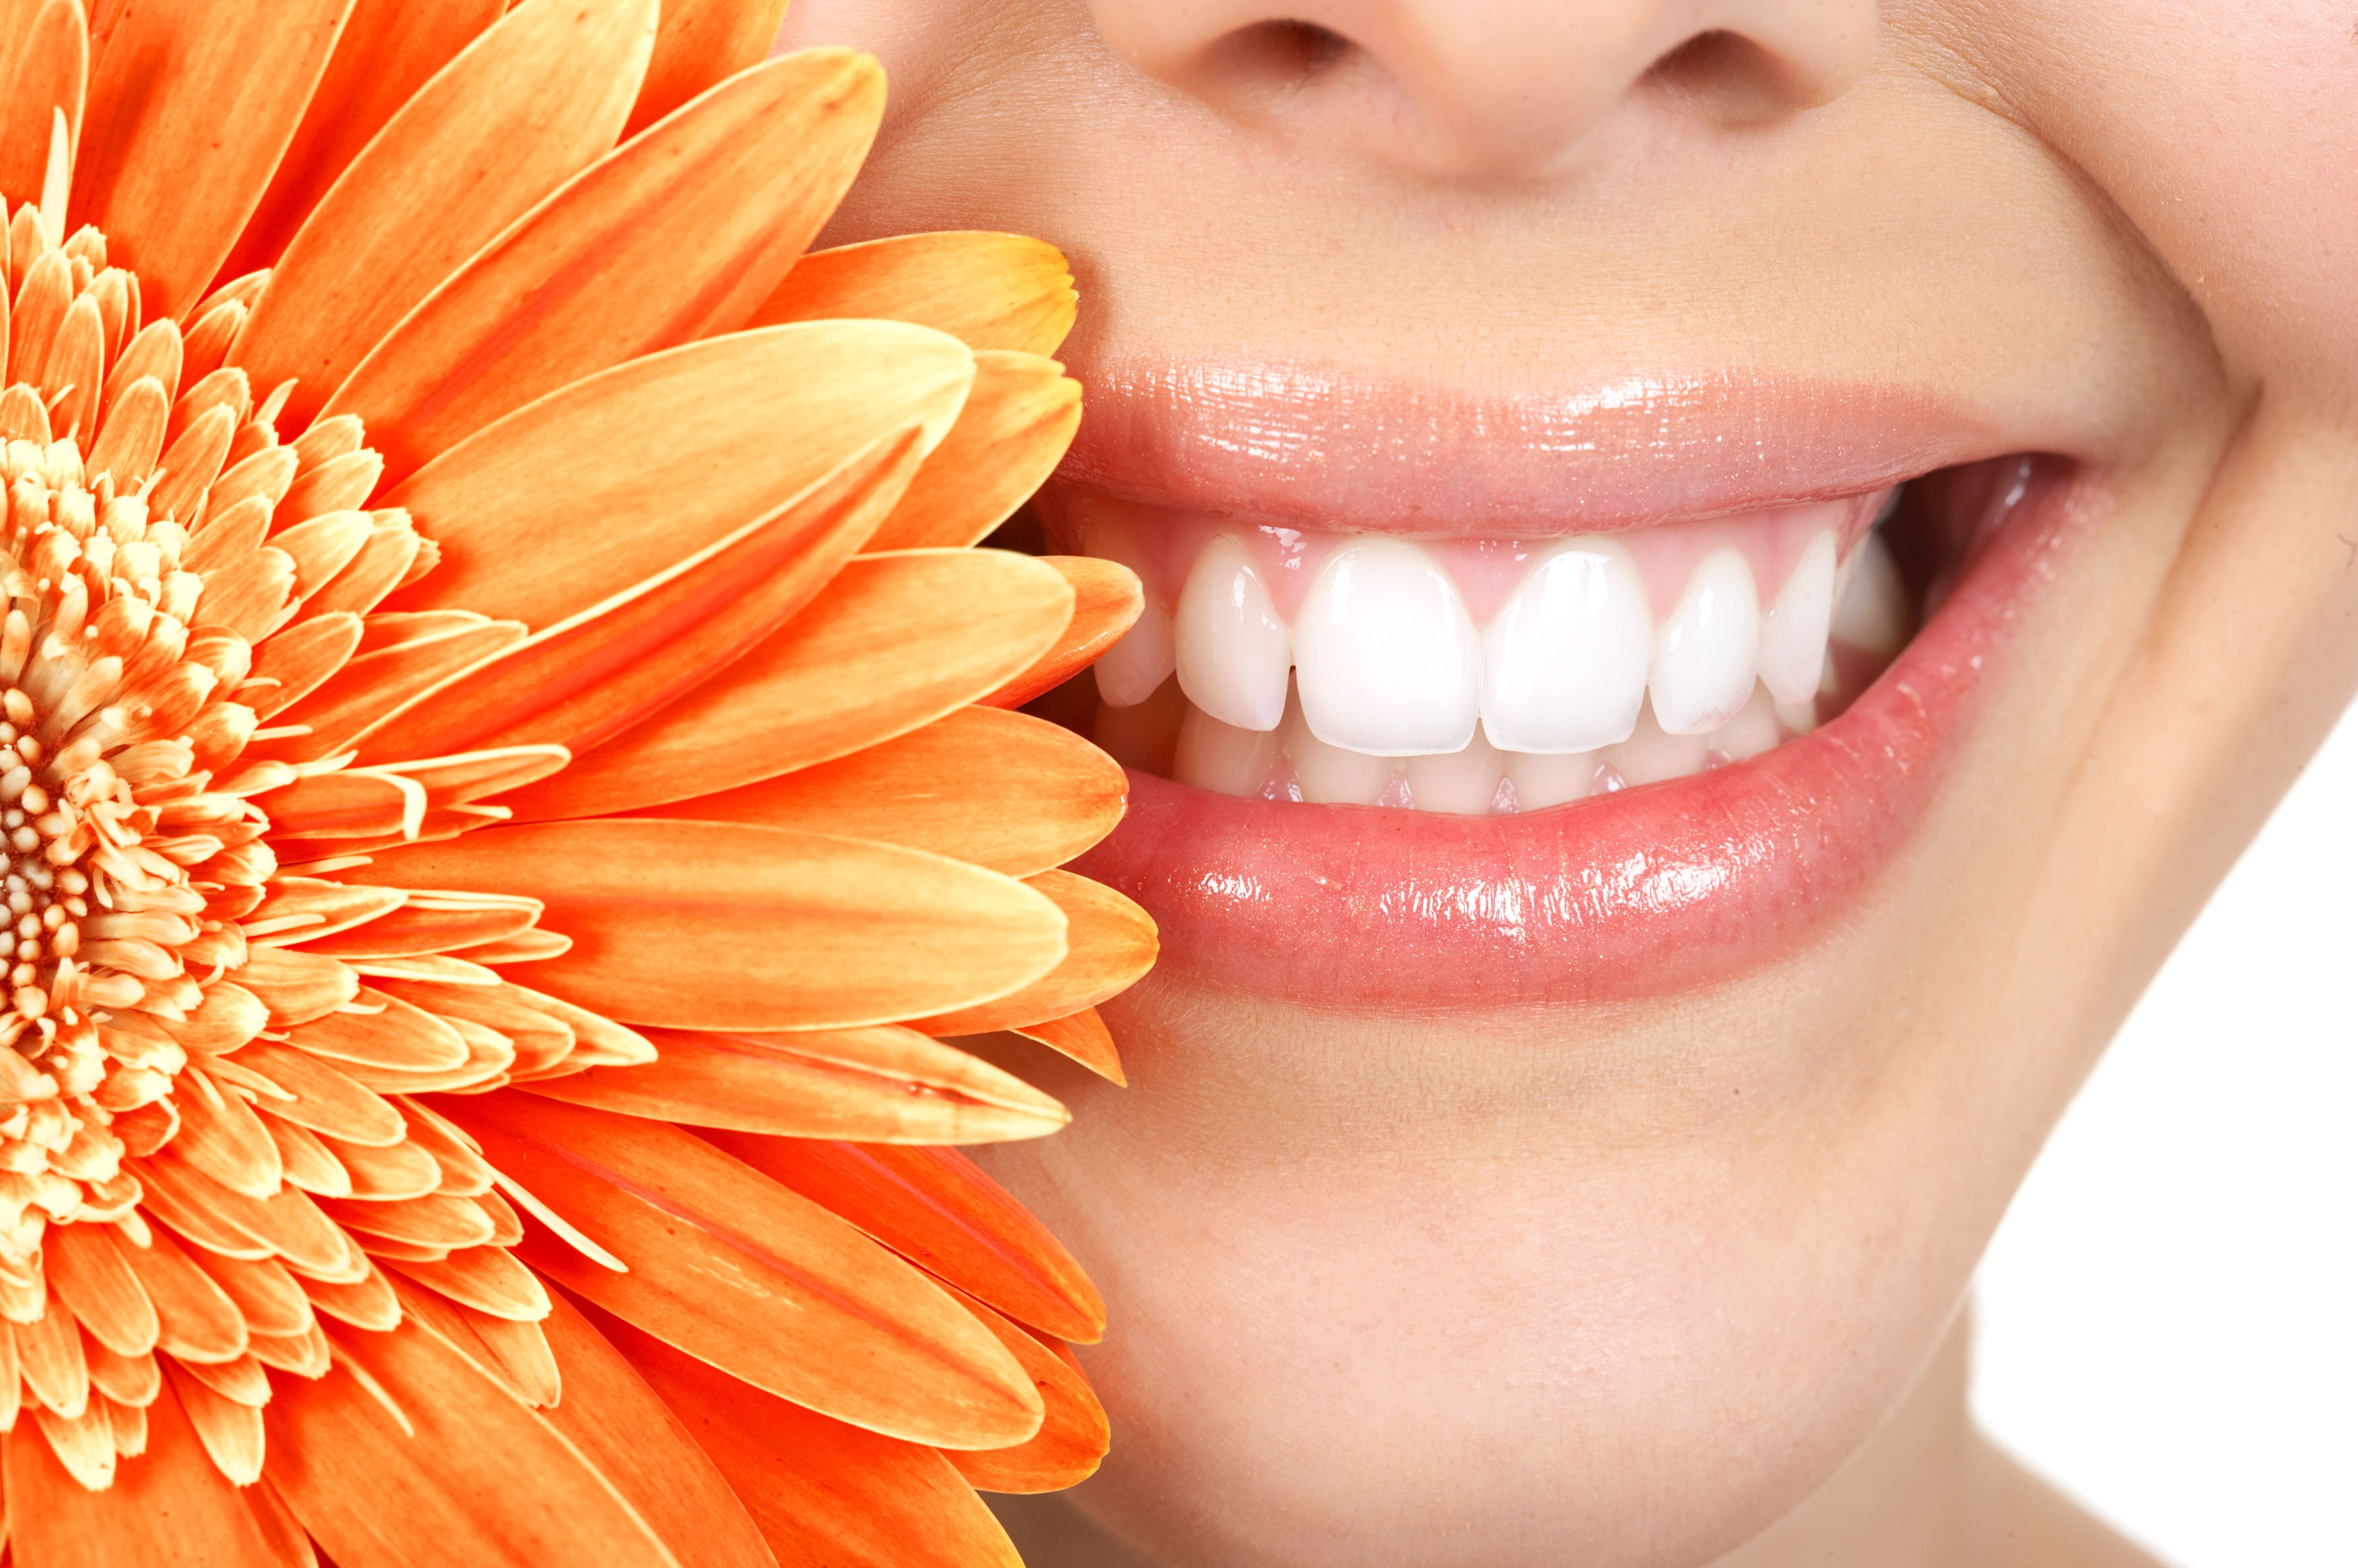 Ortodoncia invisalign enSan Fernando